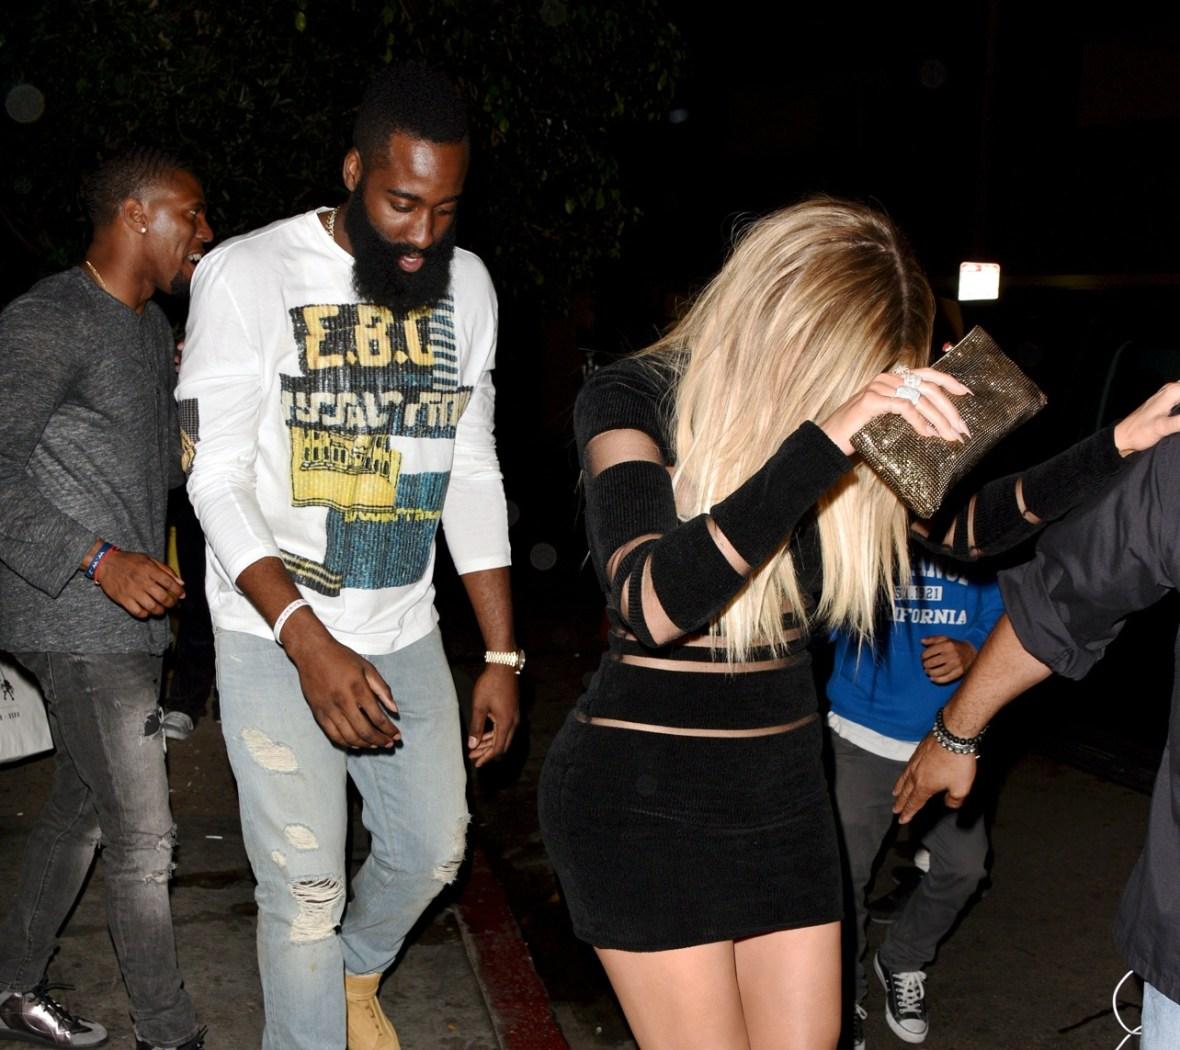 khloe kardashian and james harden